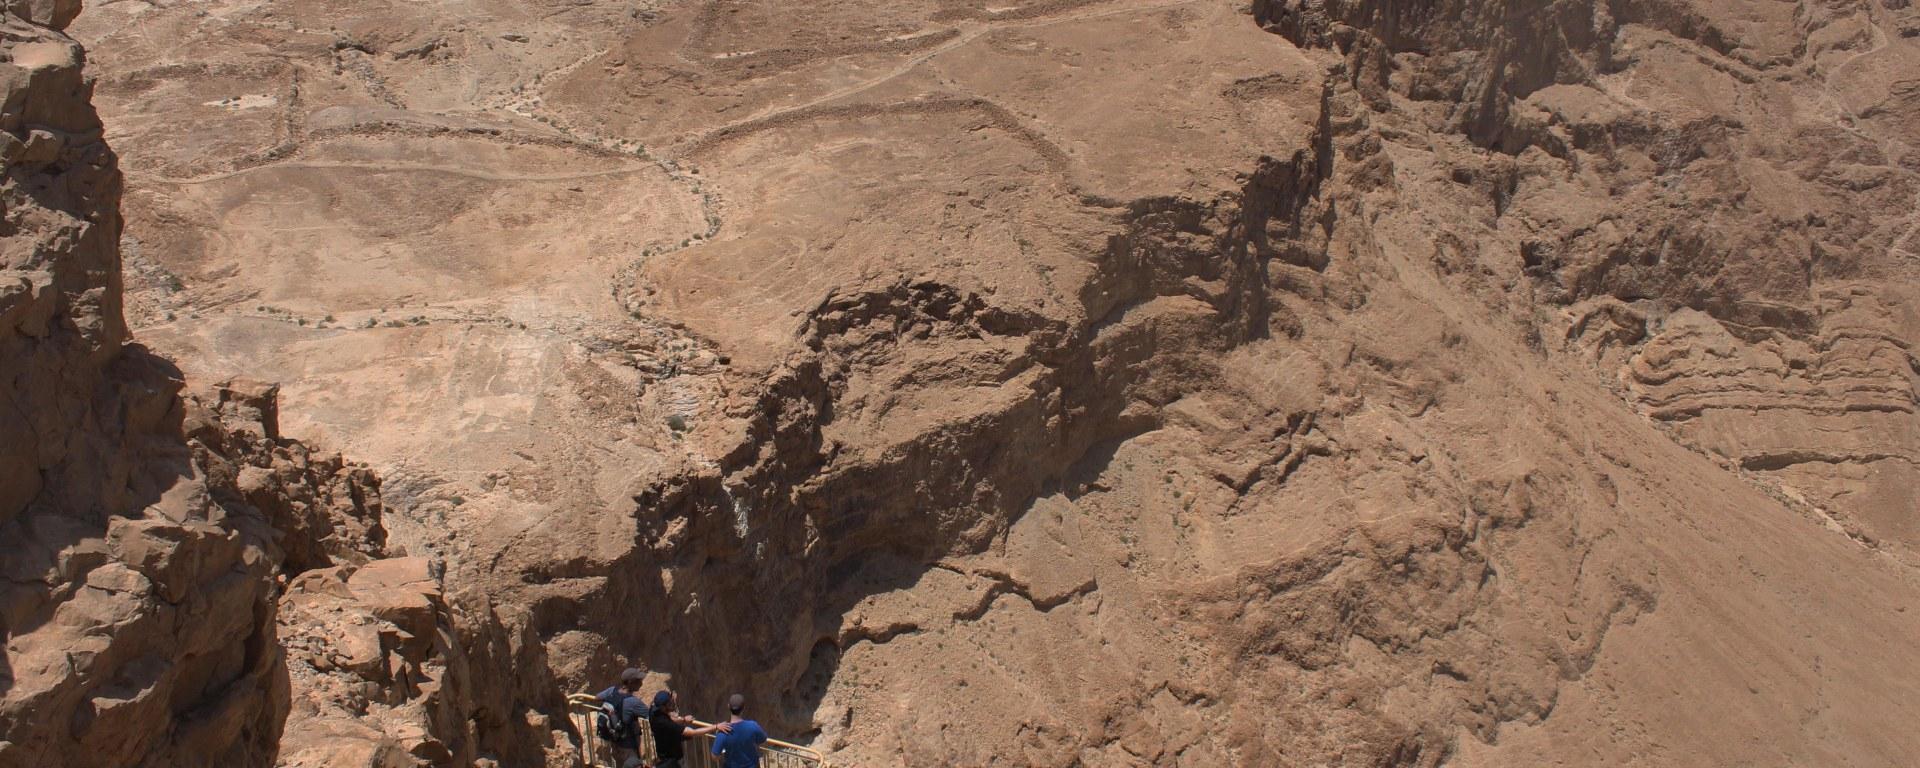 Masada, Israel, travel, photography, photos, culture, life, travel photography